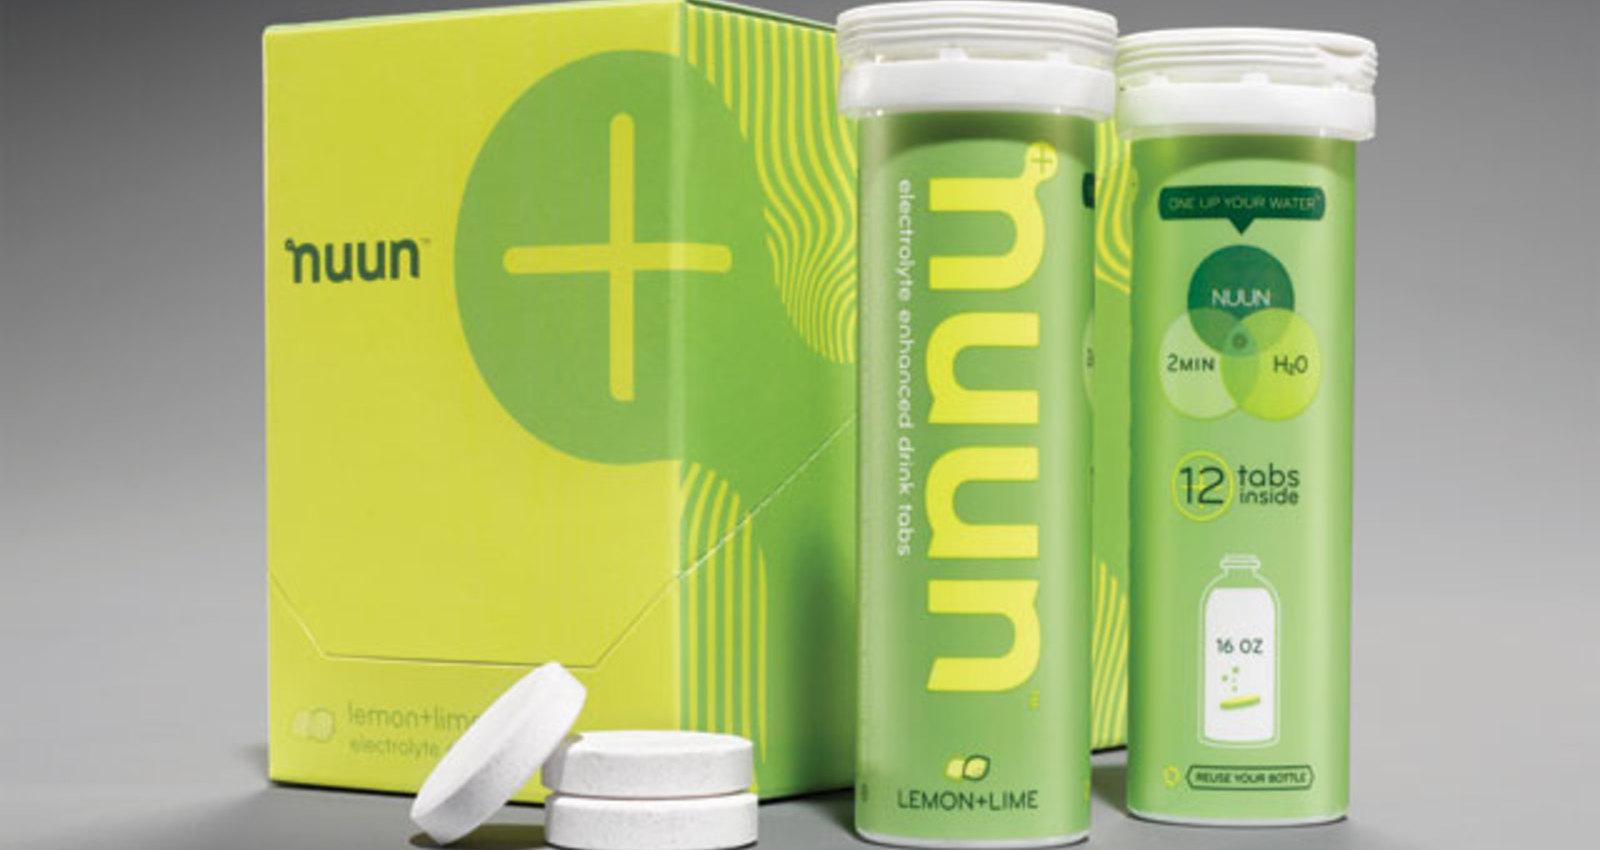 NUUN Lemon + Lime